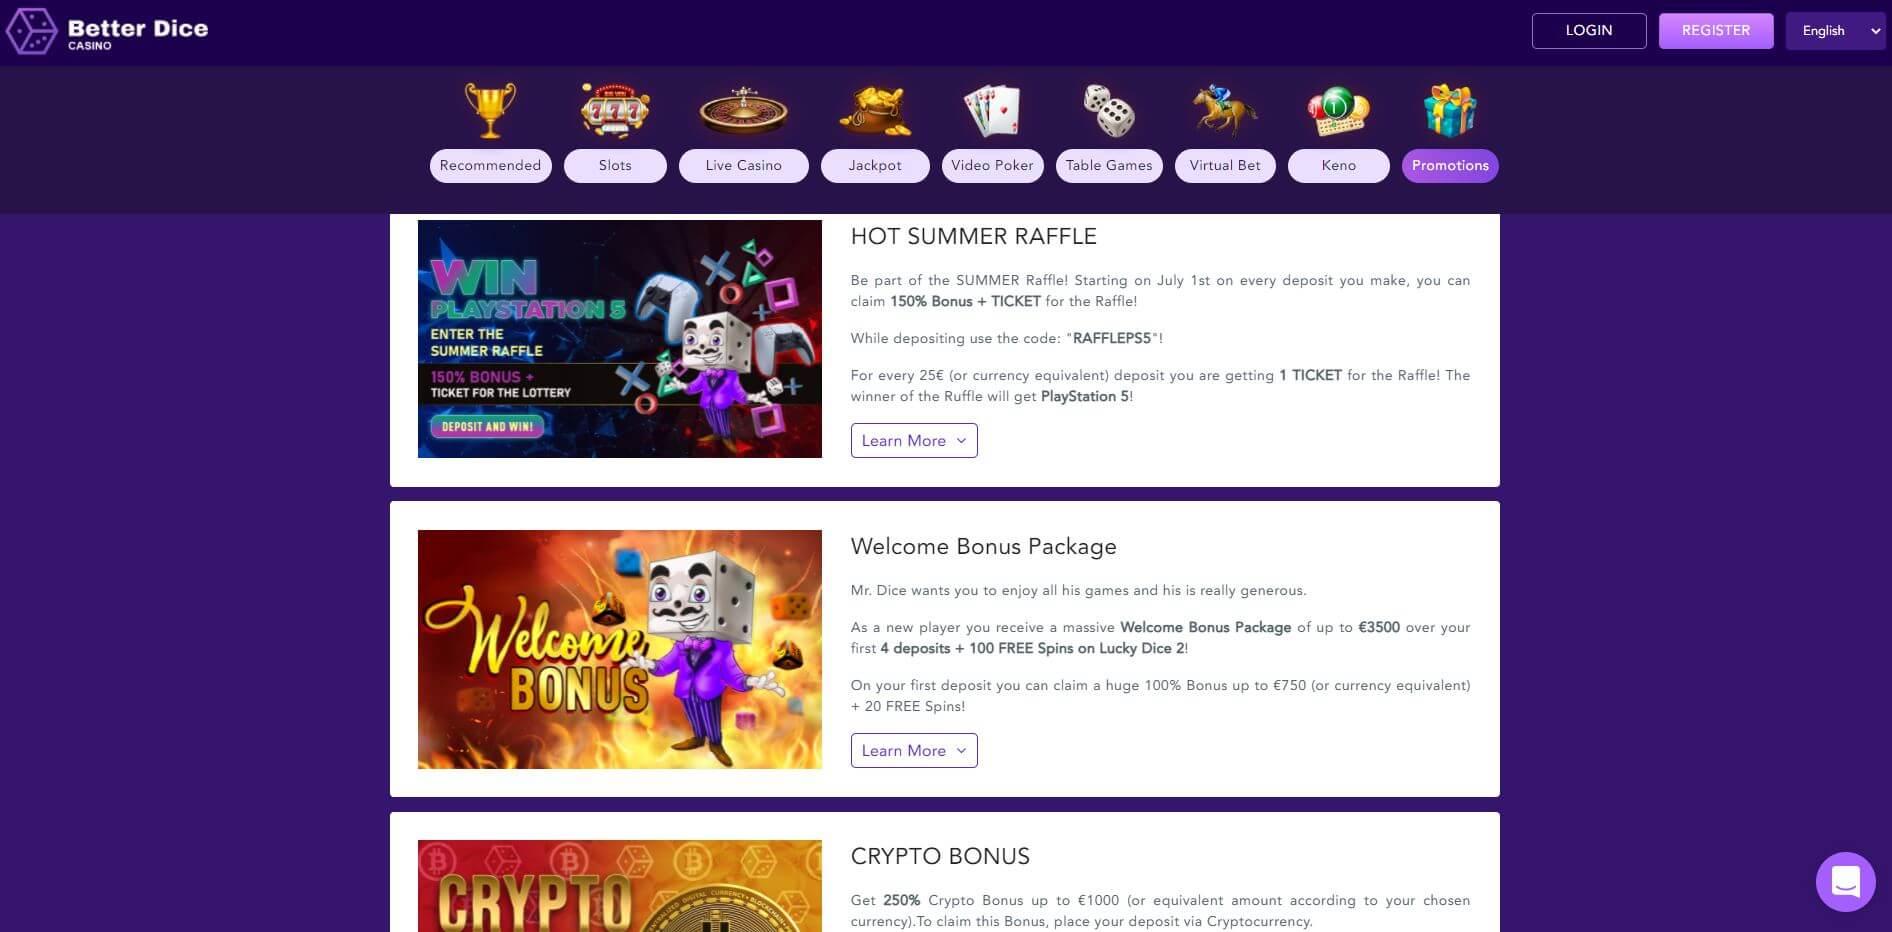 BetterDice Casino Promotions